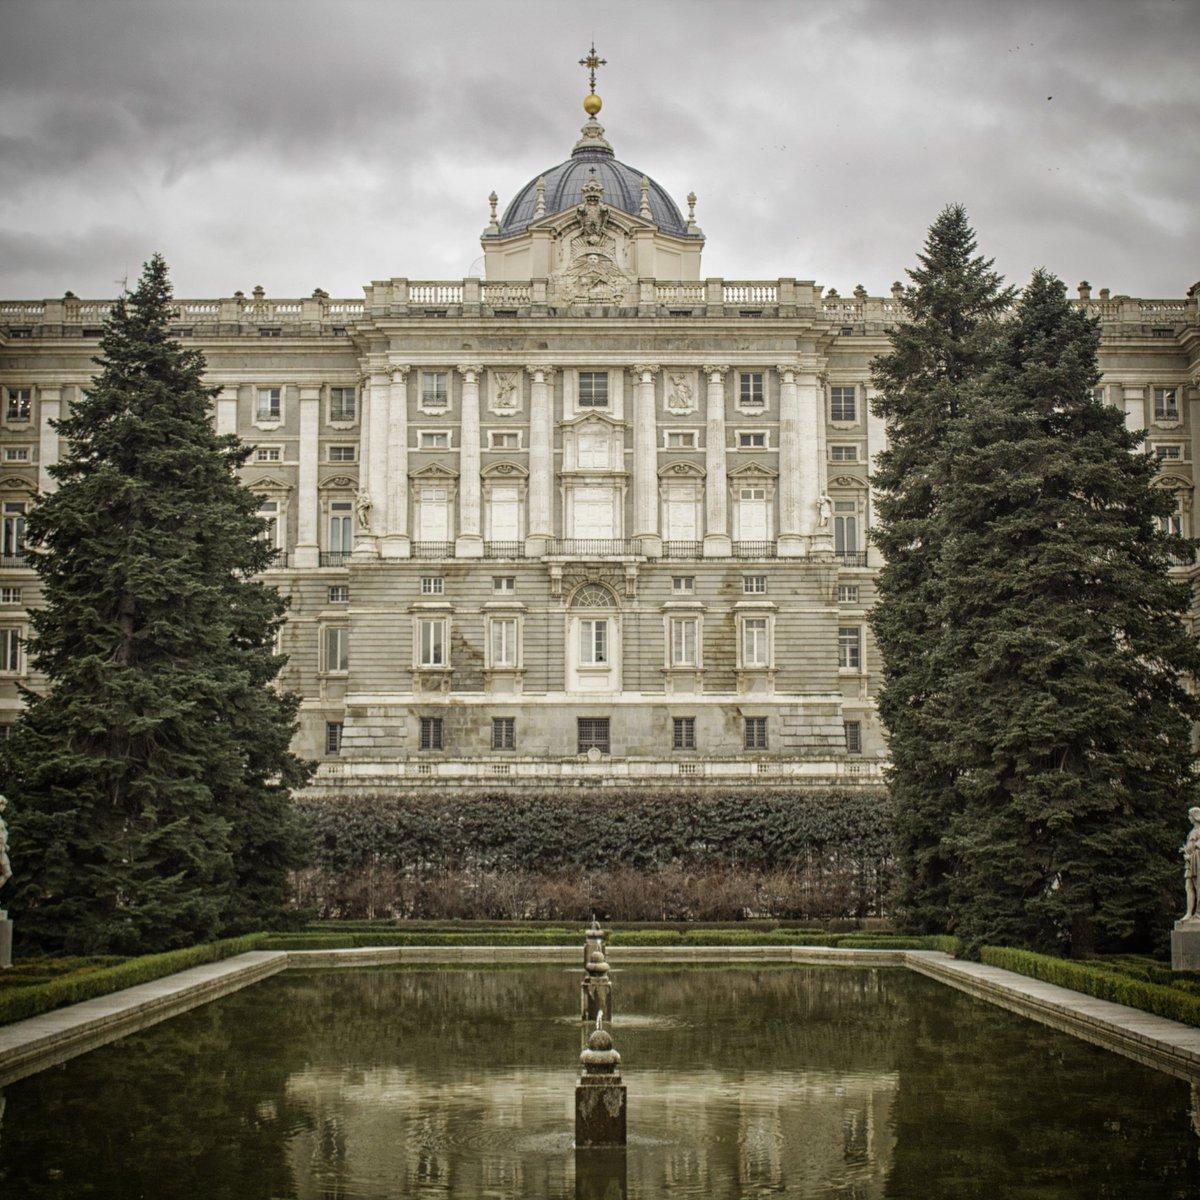 🖼 Palacio Real de Madrid 📸 Canon EOS 1300D  #Madrid #Spain #travelphoto #picoftheday #photography